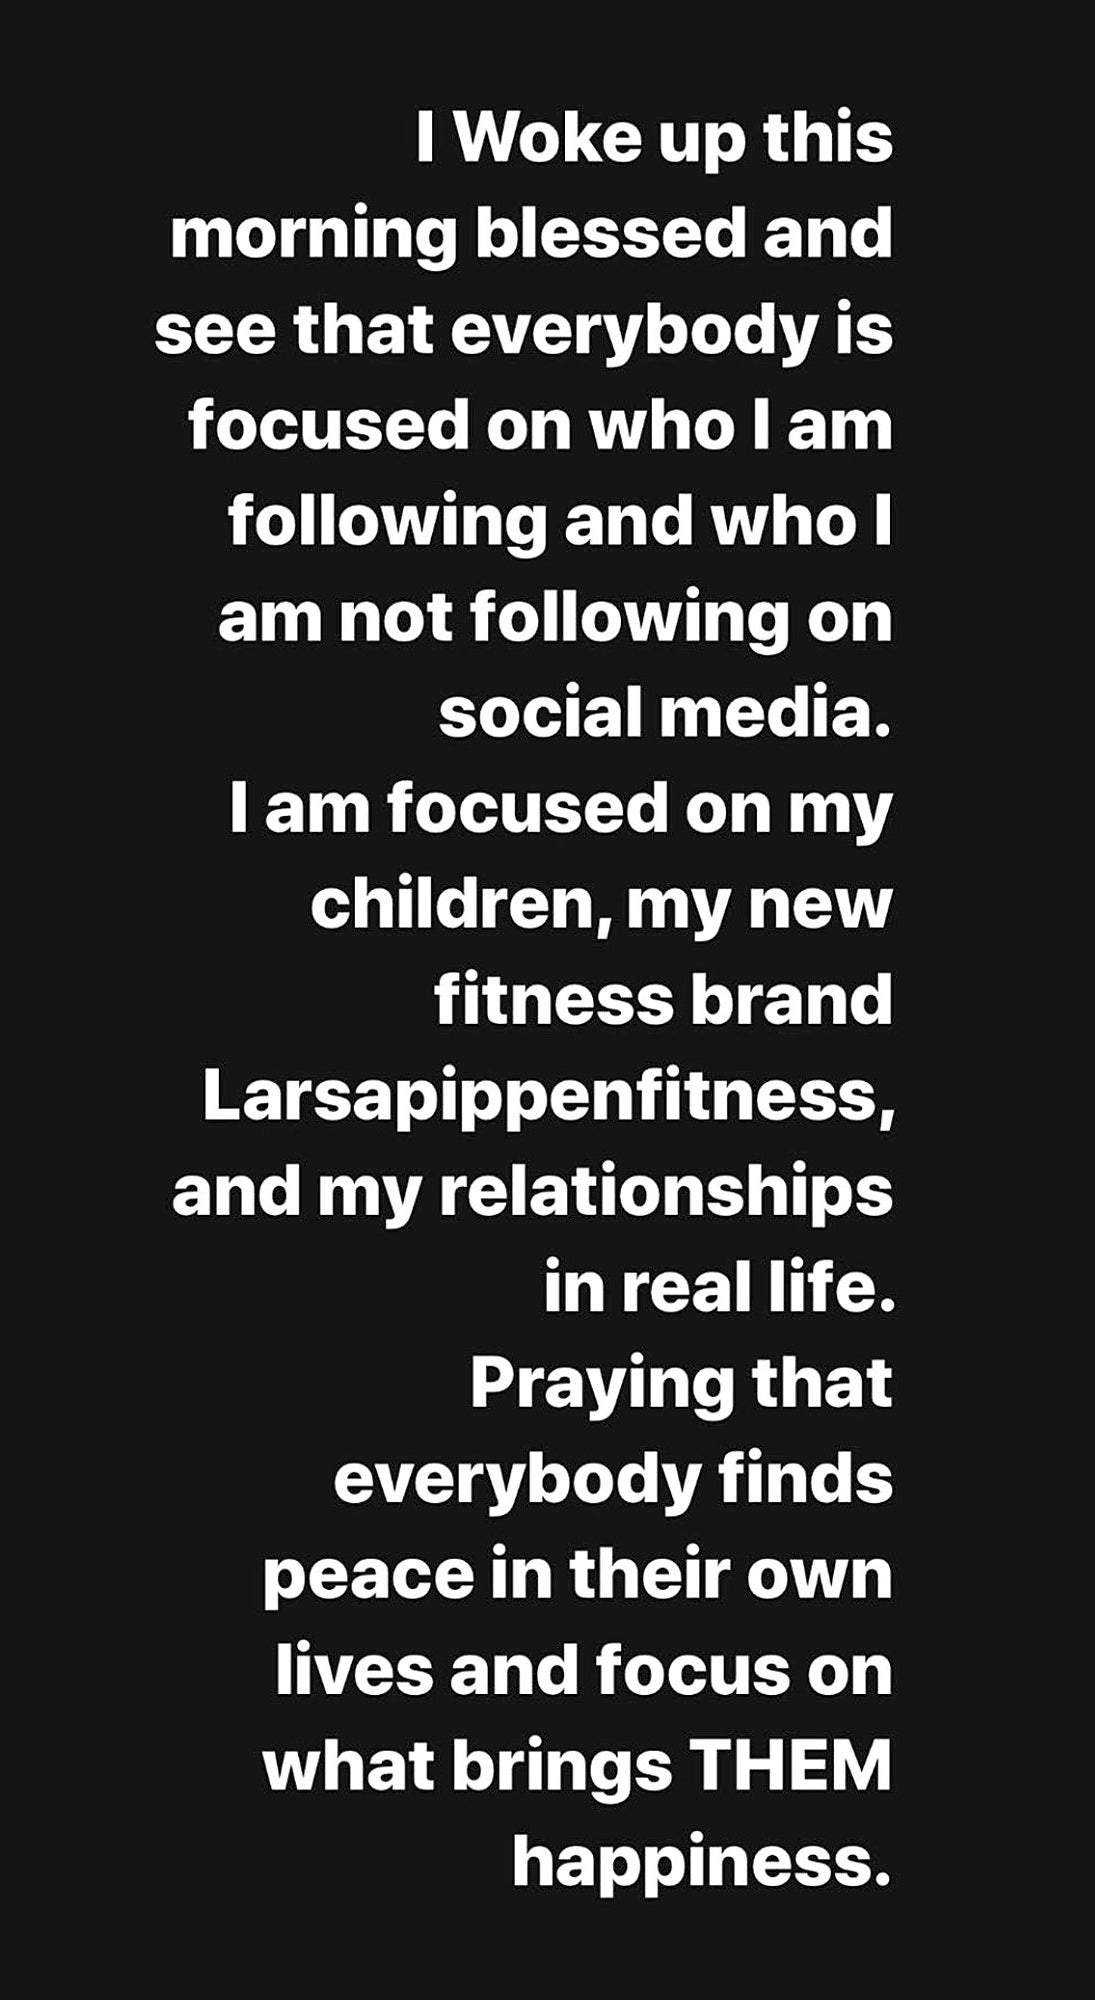 Screenshot of Larsa Pippen's Instagram statement